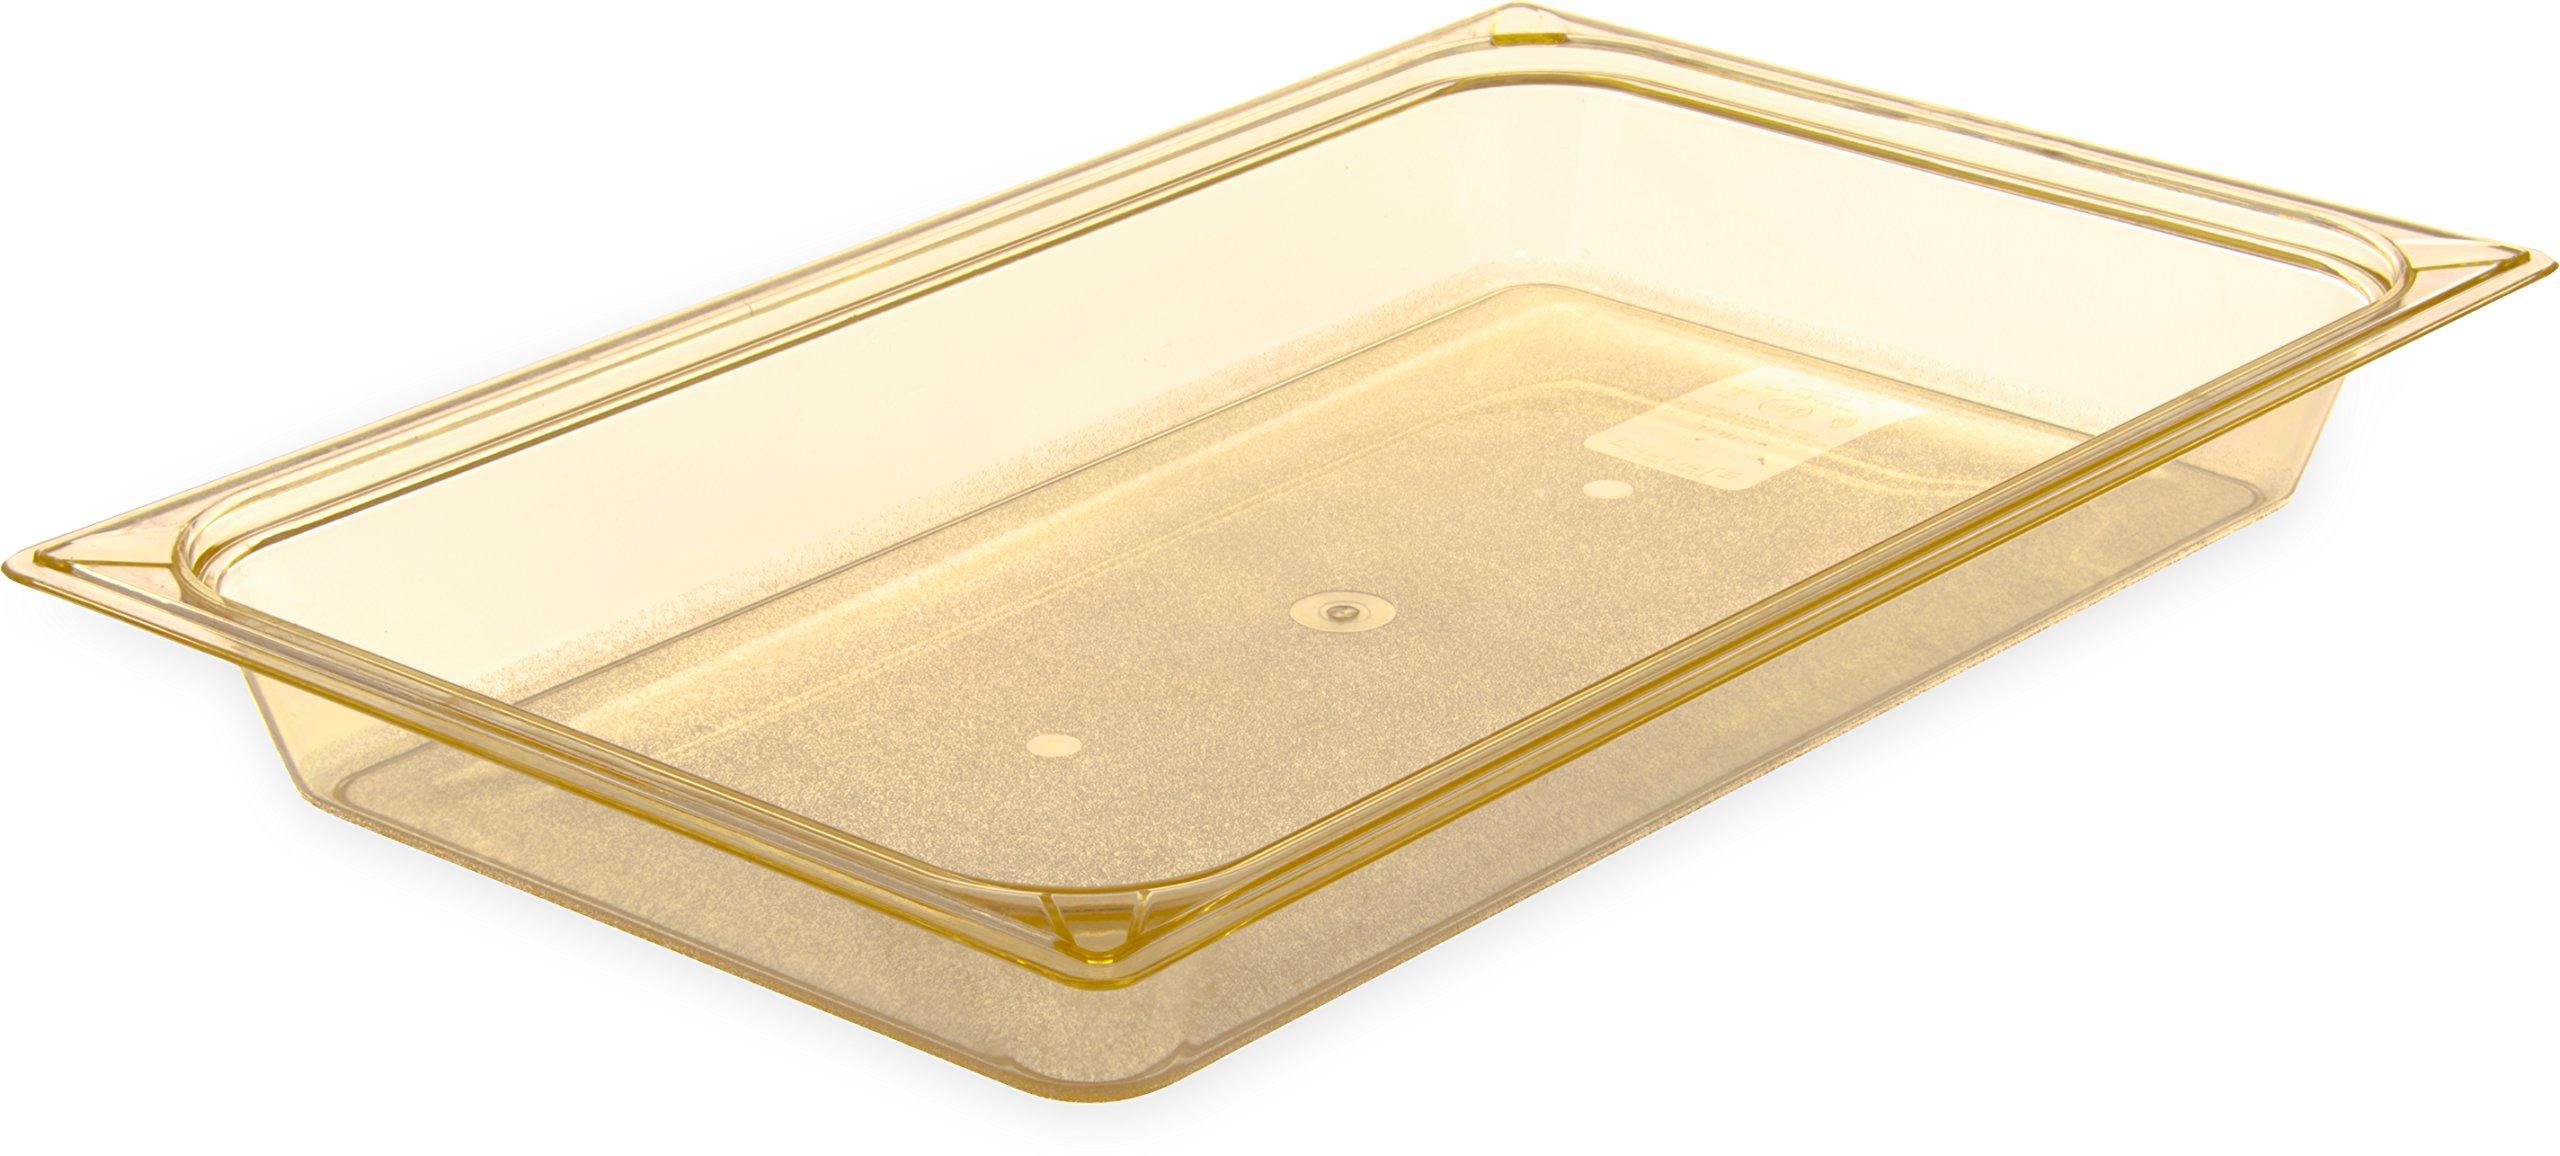 Carlisle 10400B13 High-Heat Full-Size Food Pan, 7.6 qt. Capacity, 20-3/4 x 12-3/4 x 2-1/2'', Amber (Case of 6)